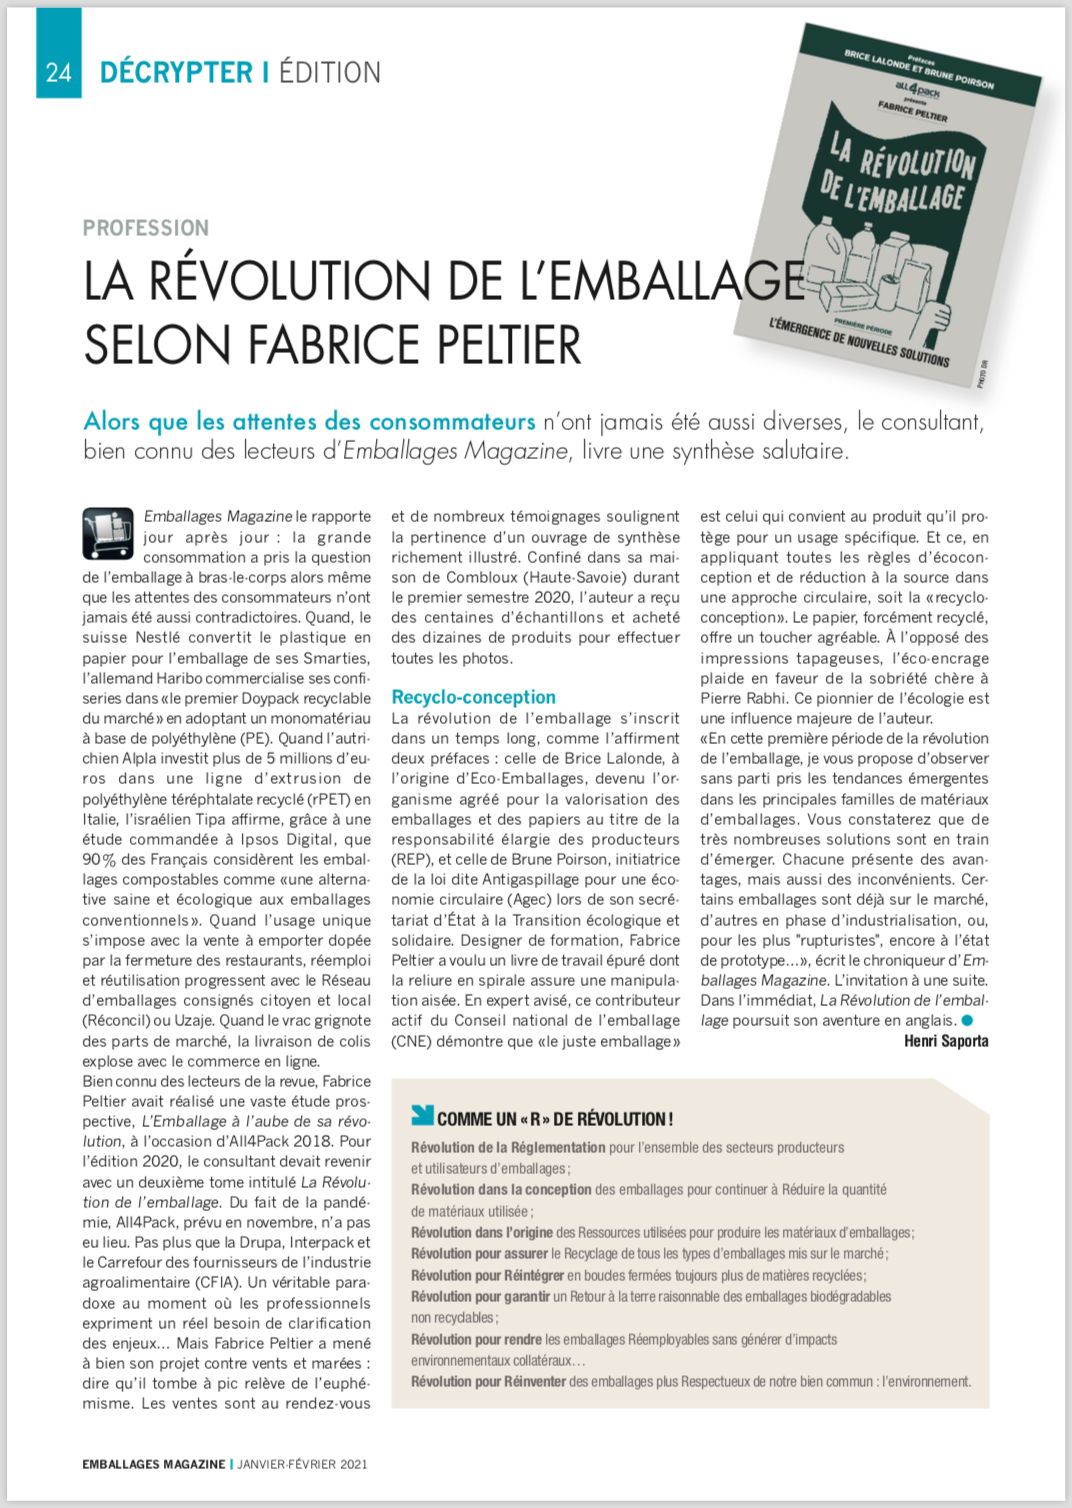 La révolution de l'emballage - Fabrice Peltier